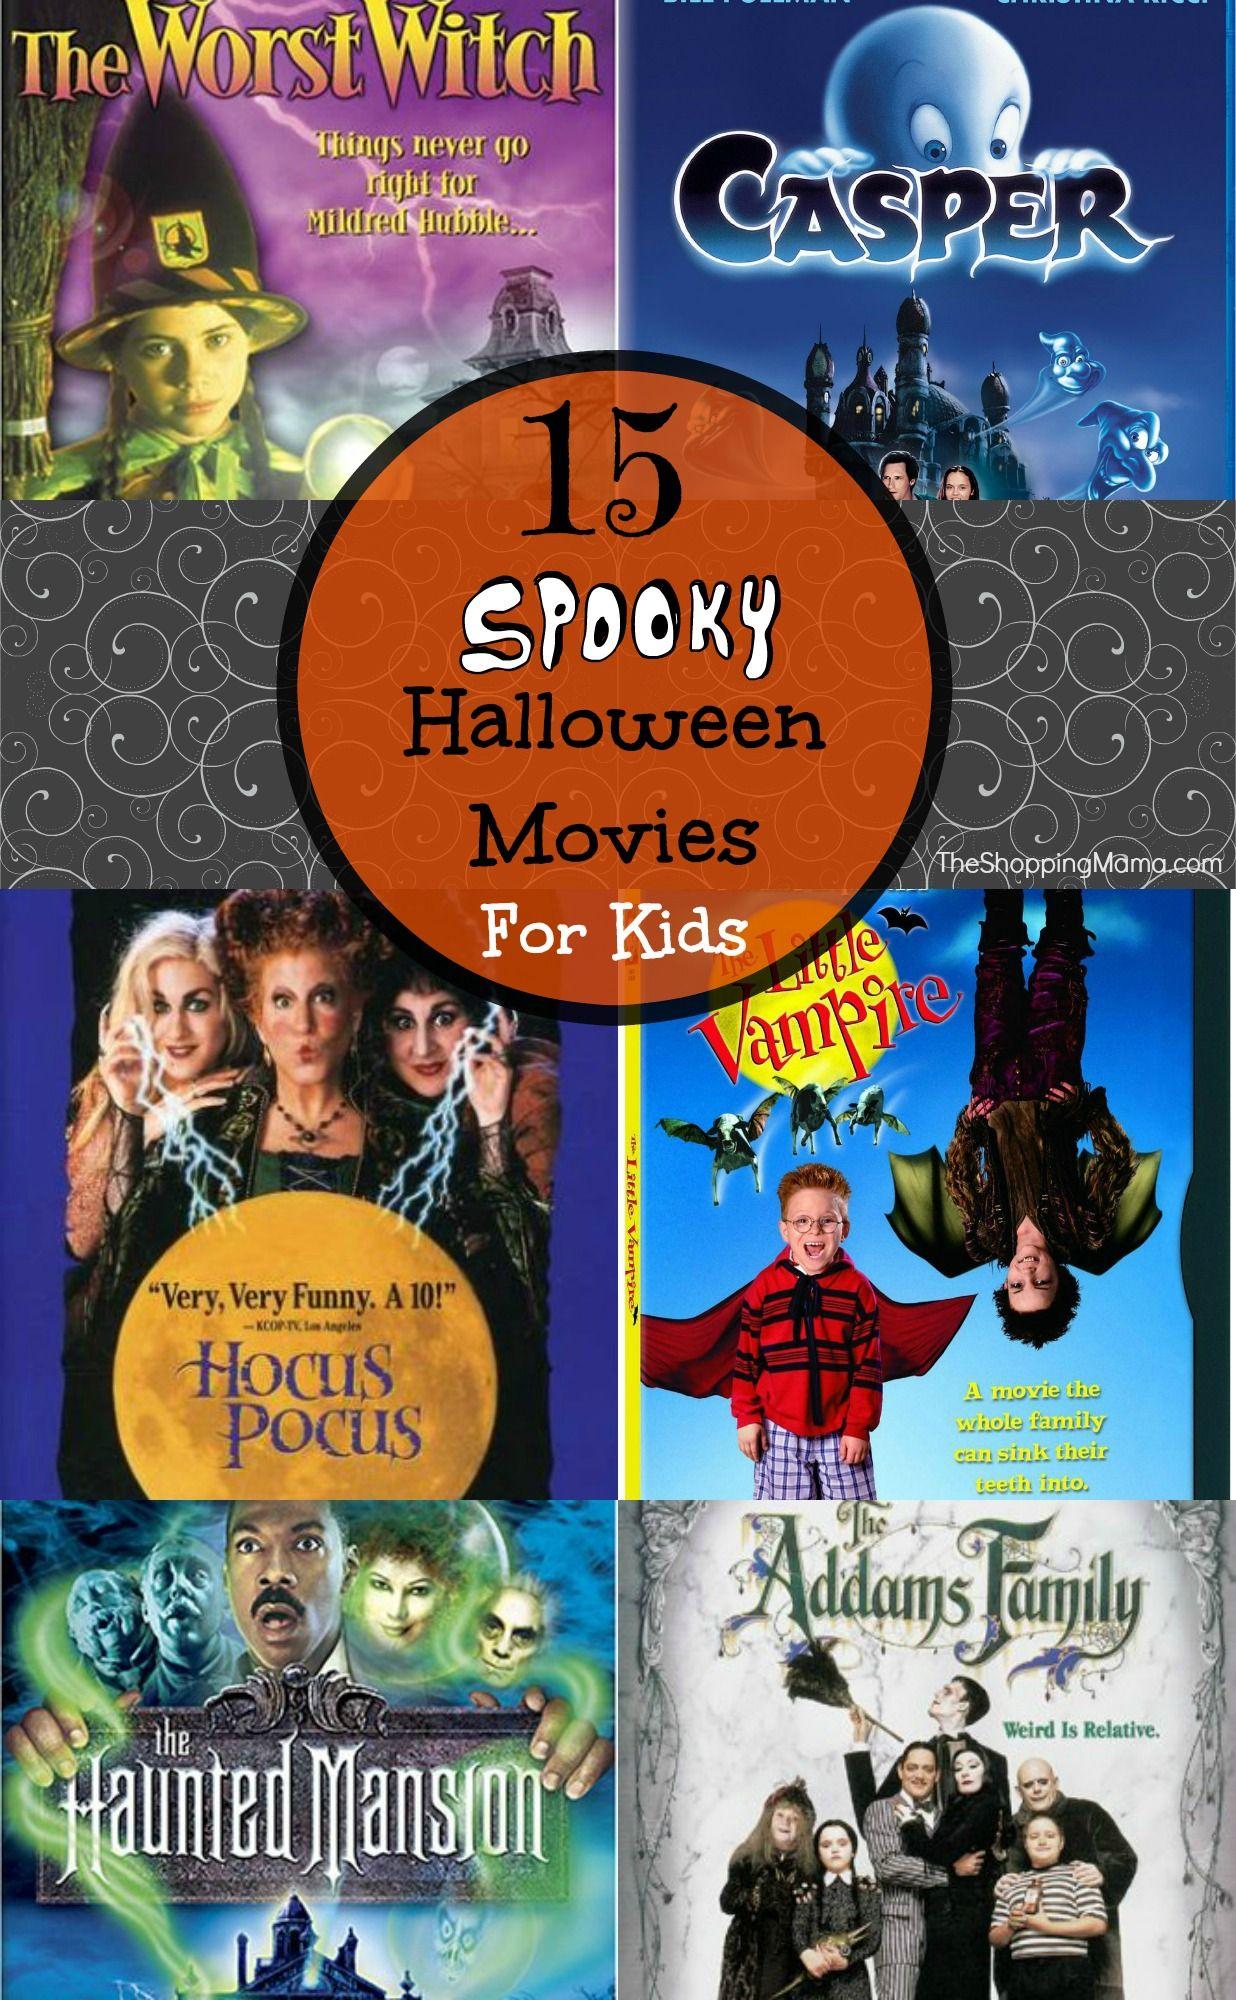 15 Spooky Halloween Movies For Kids Kid friendly